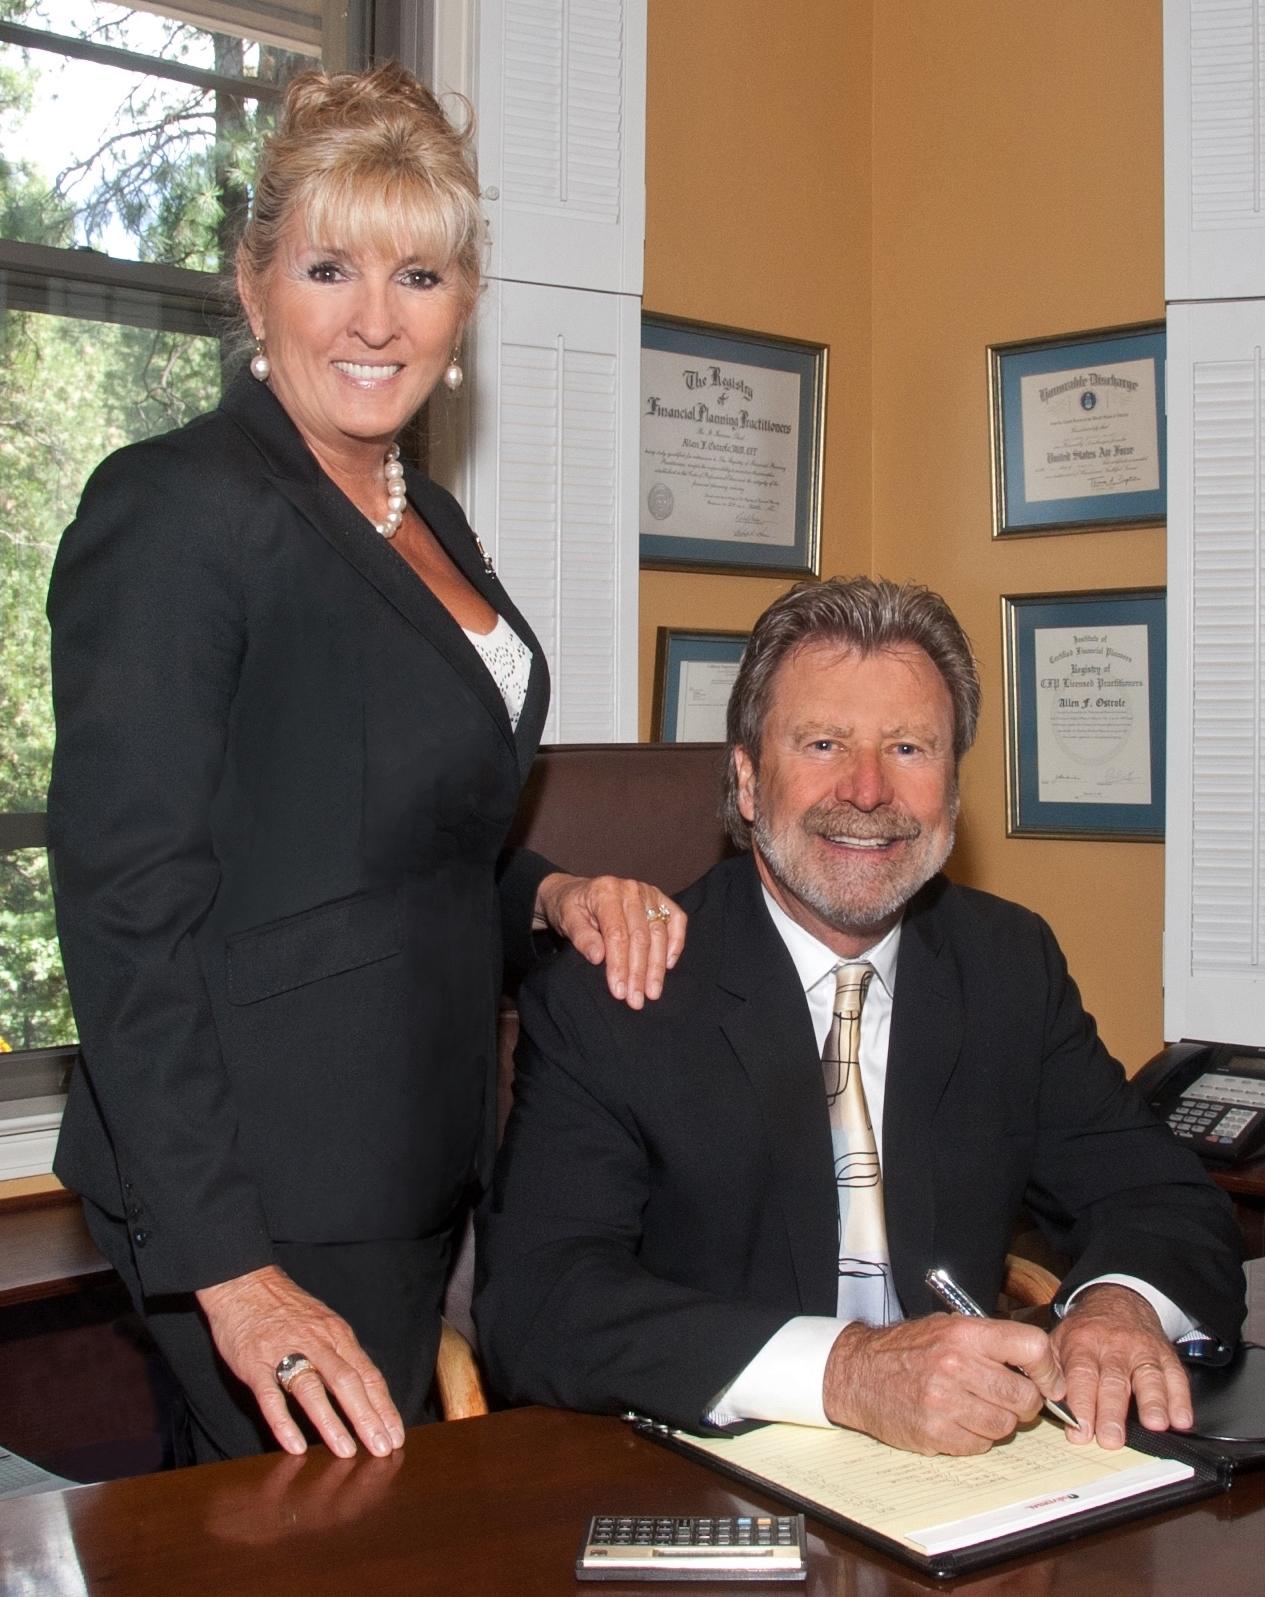 Allen and Sabine Ostrofe